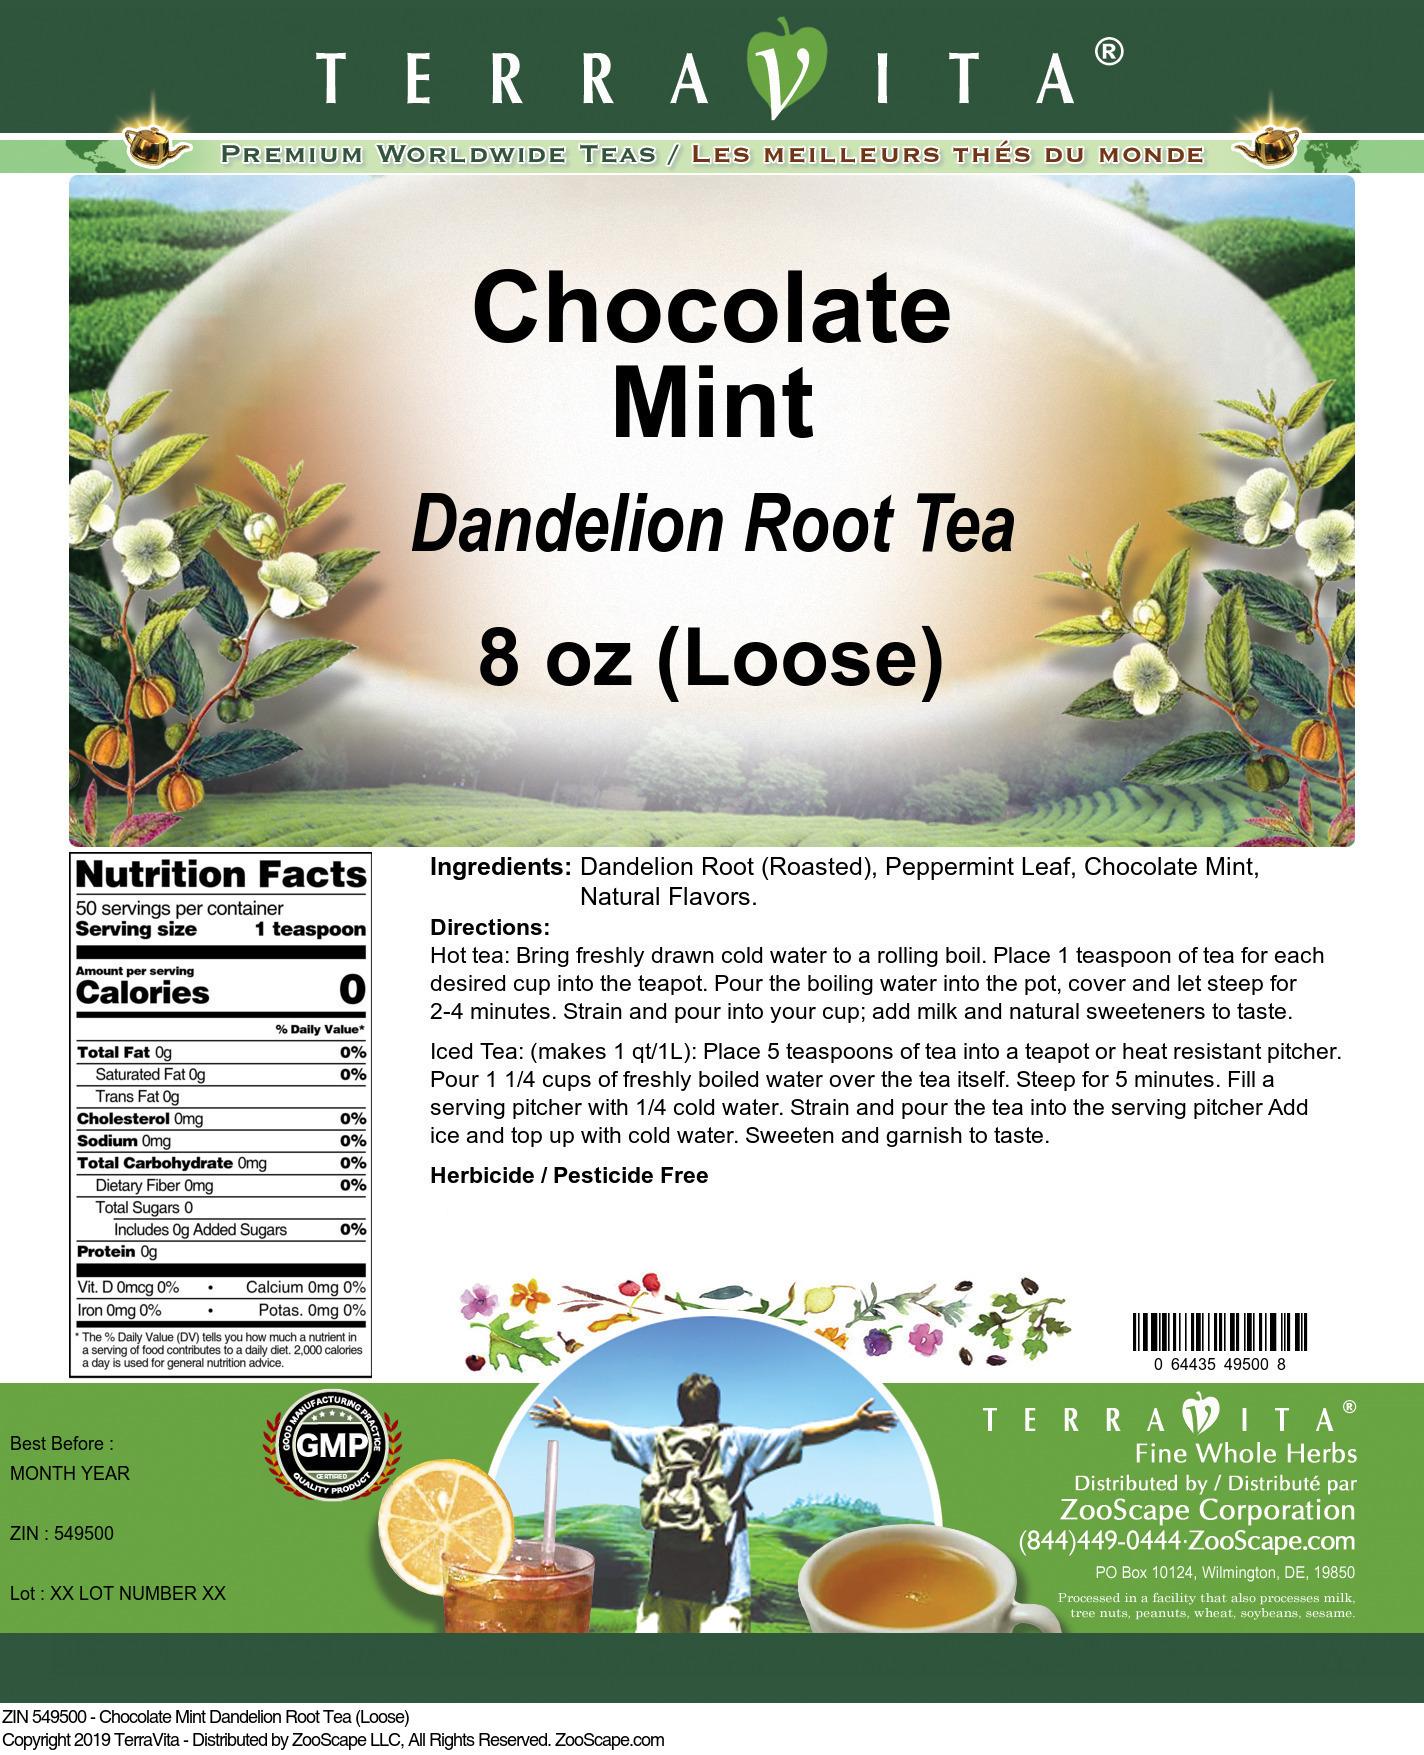 Chocolate Mint Dandelion Root